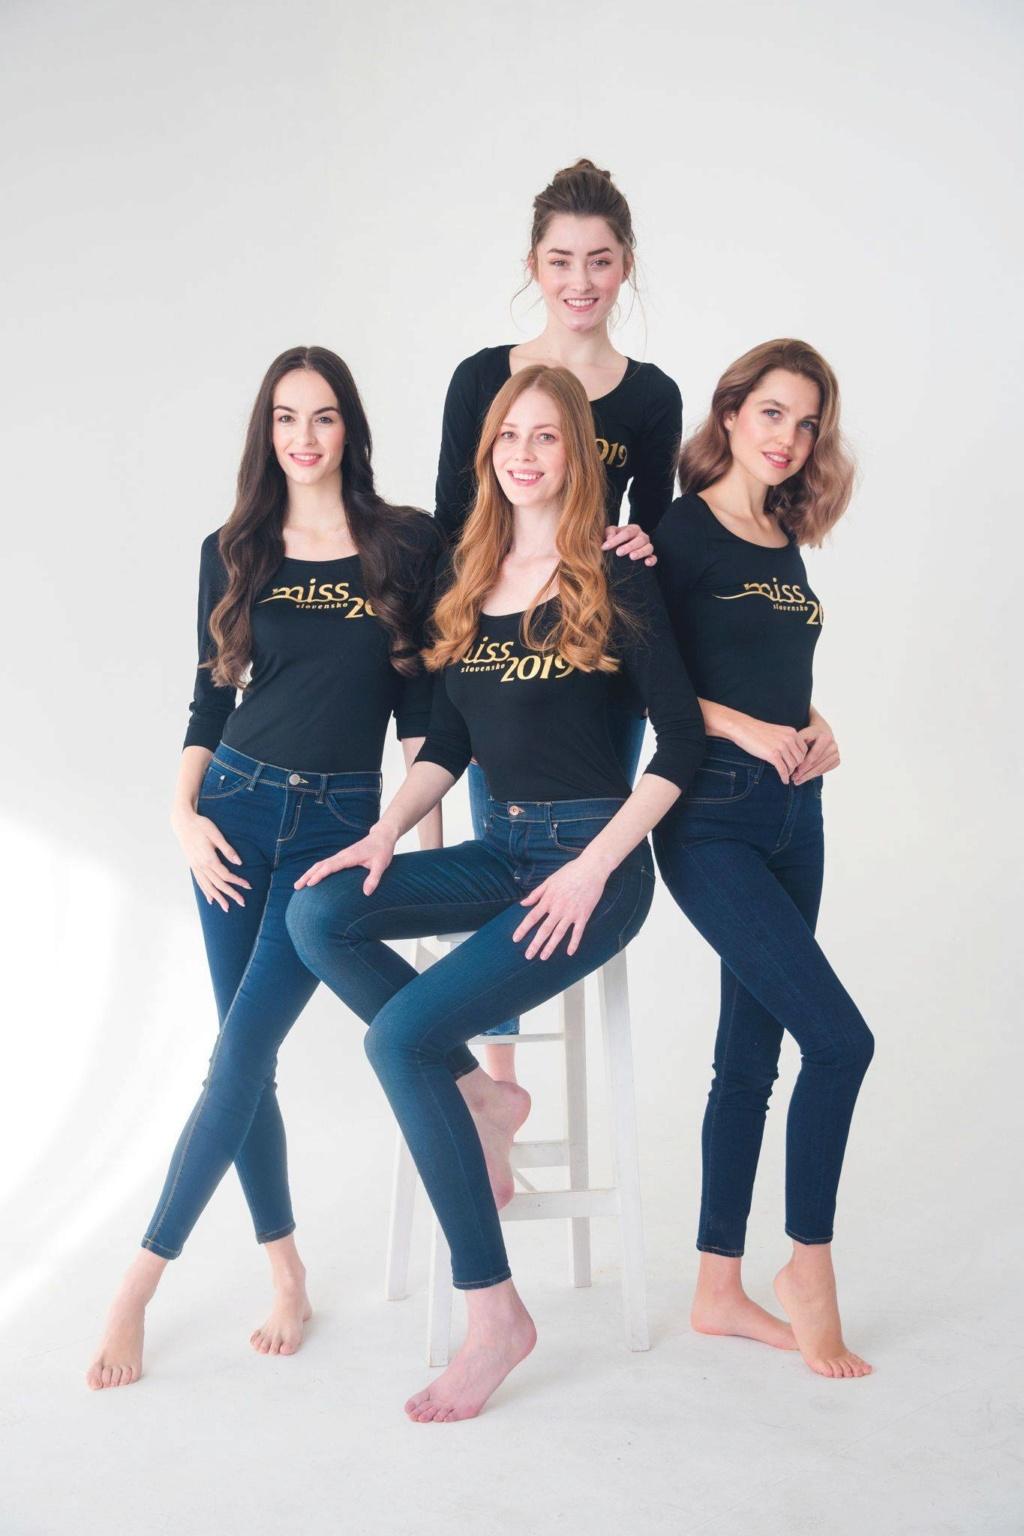 Miss Slovensko 2019 is Frederika Kurtulikova 50980310